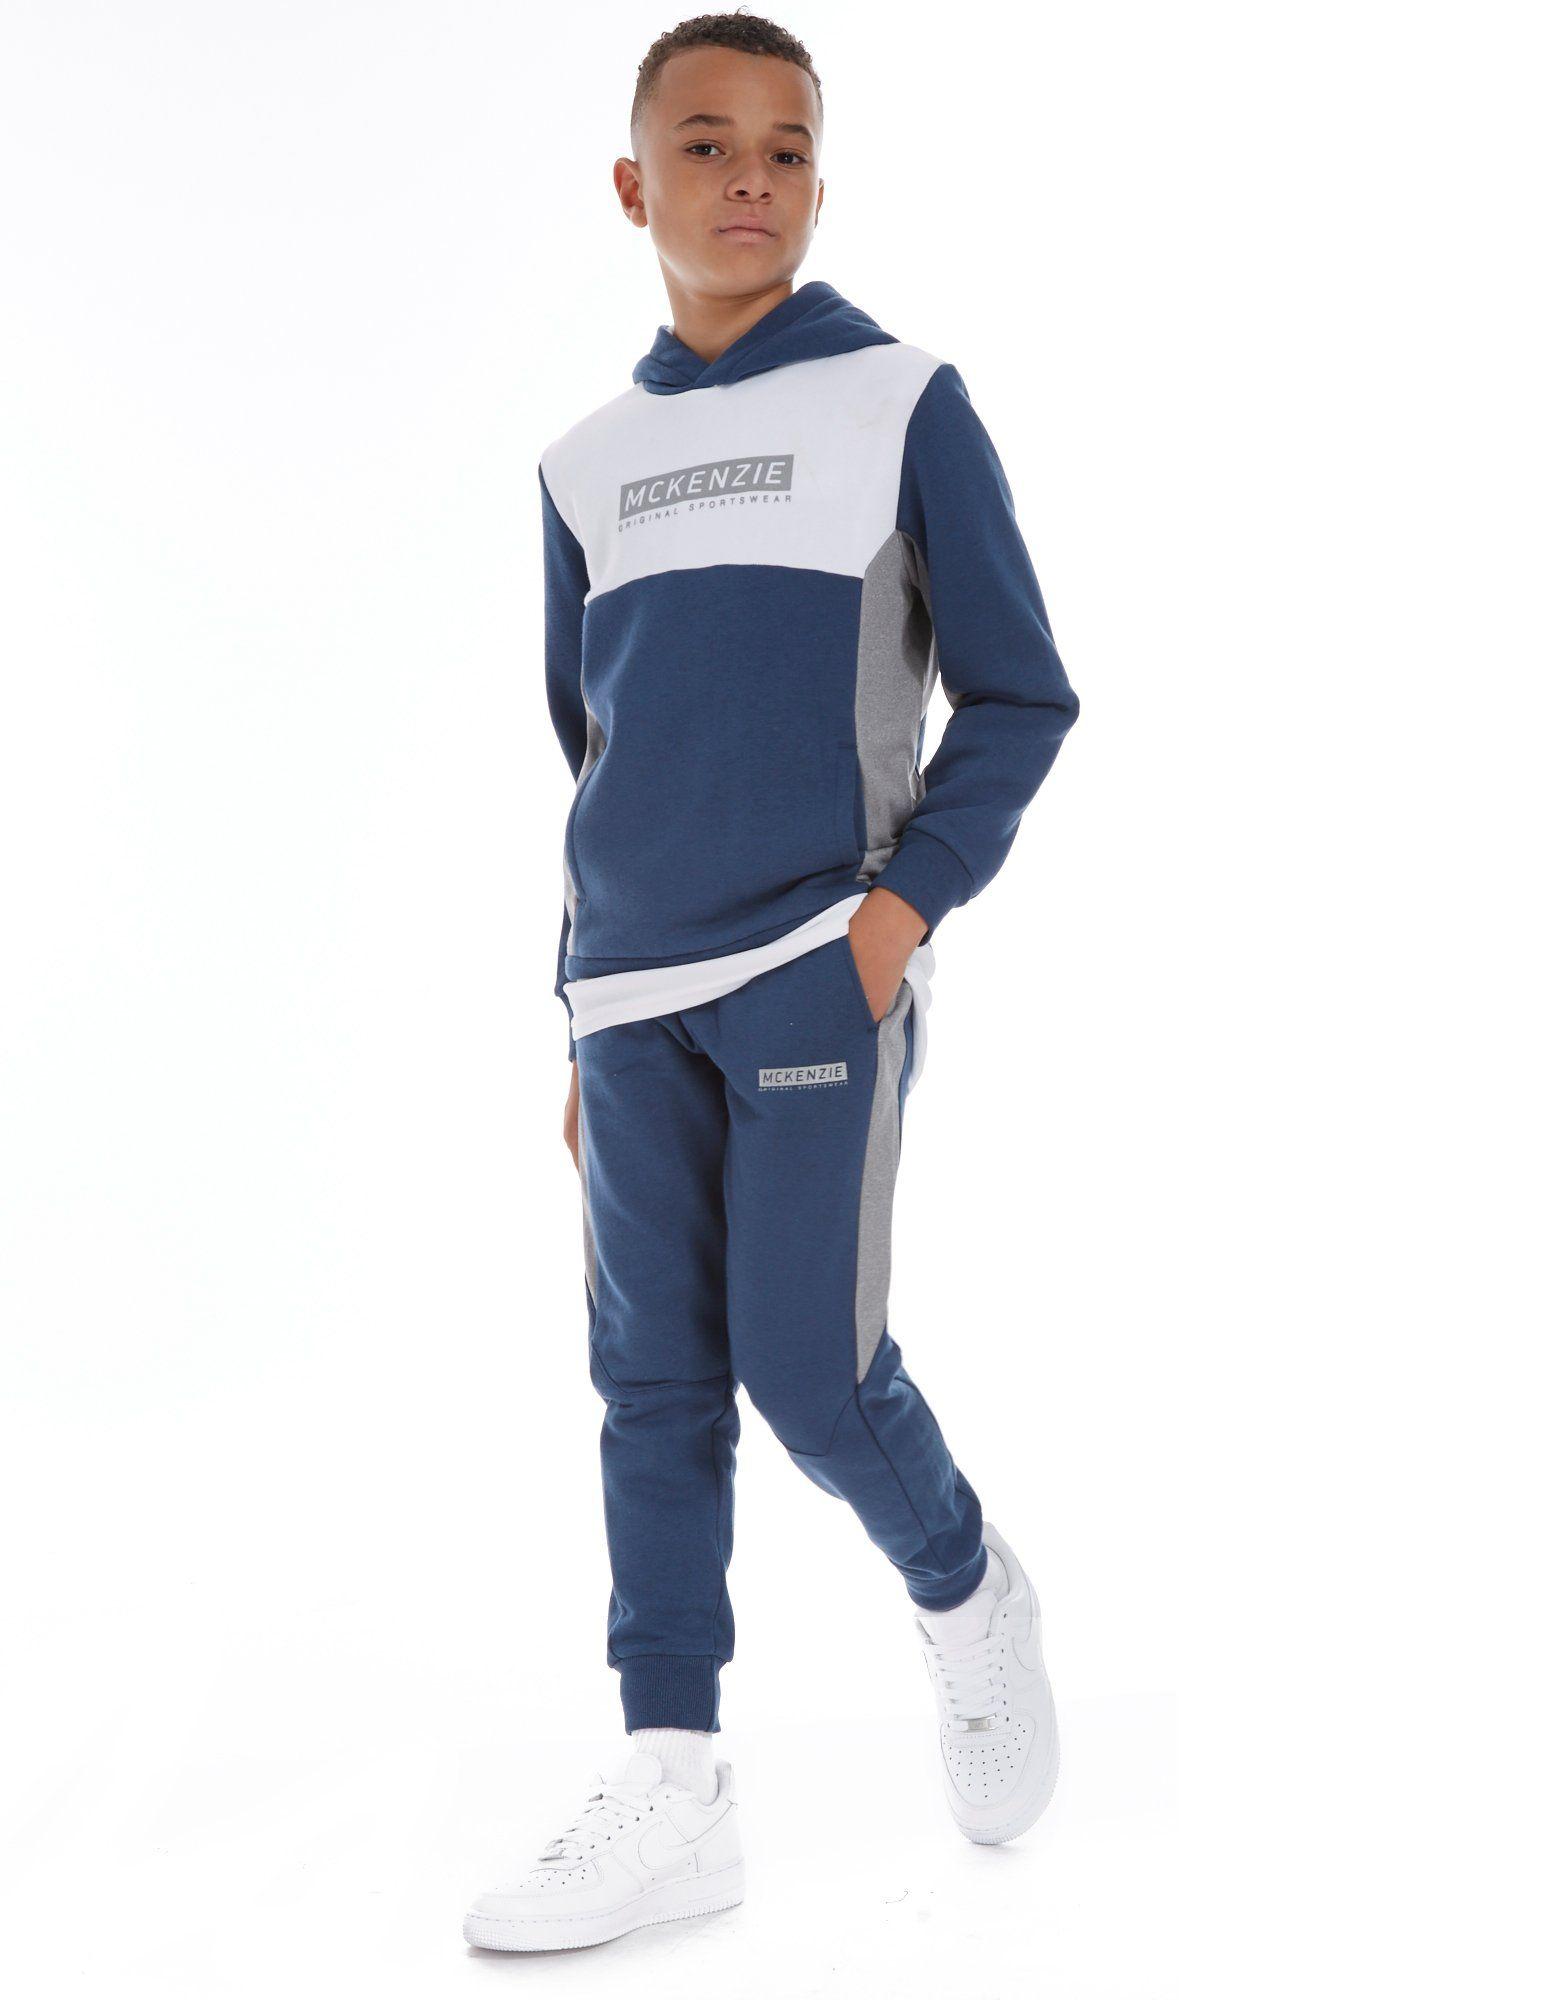 Mckenzie clothing store